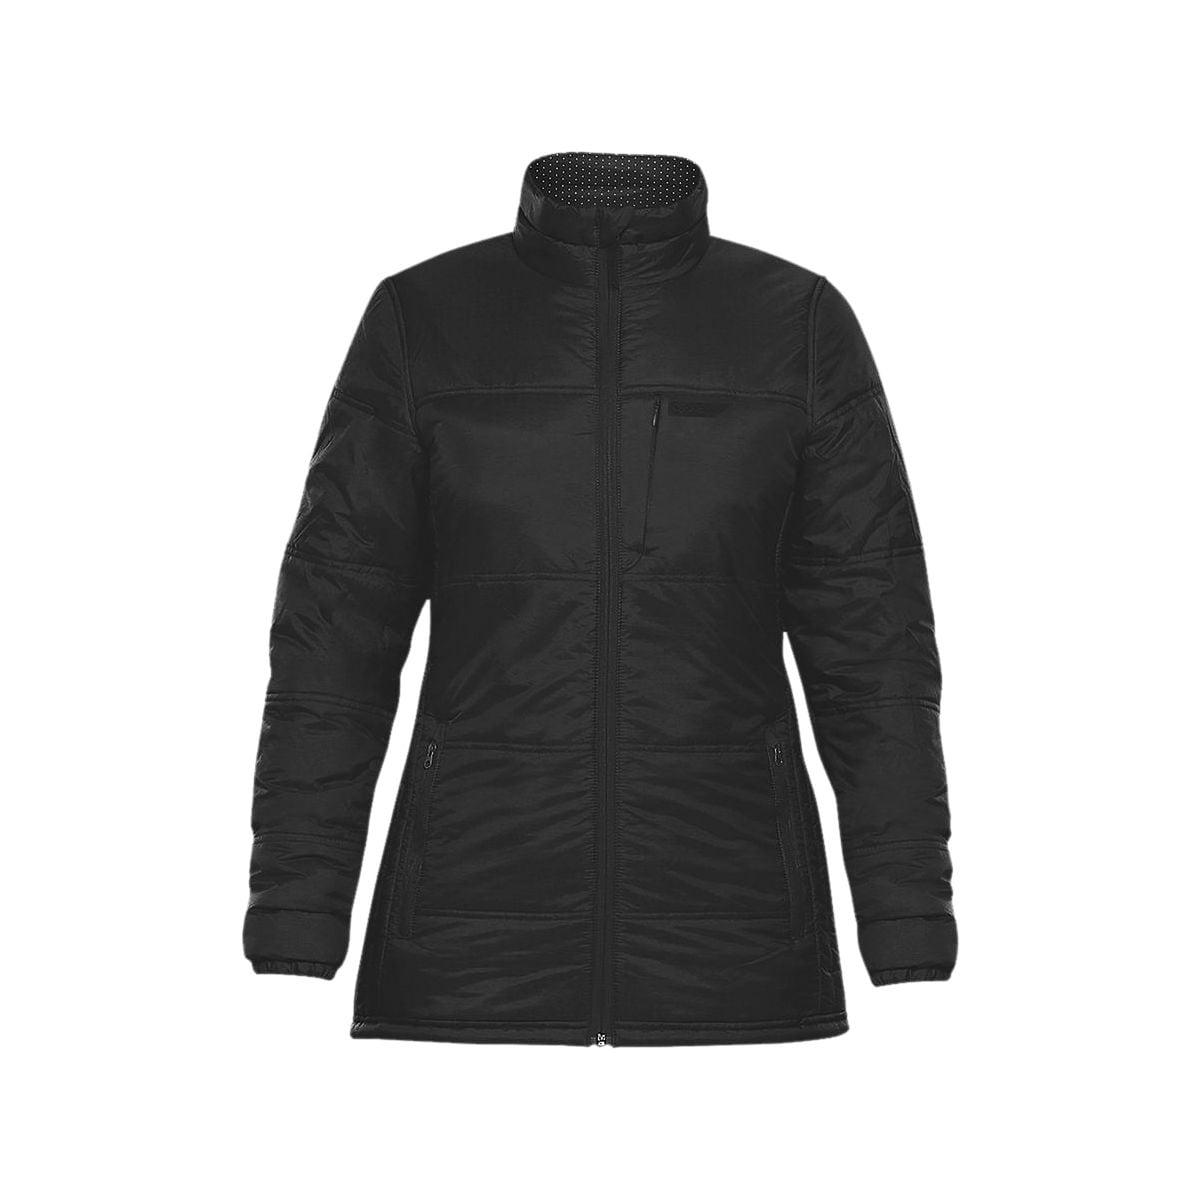 DAKINE Pinebrook Insulated Jacket - Women